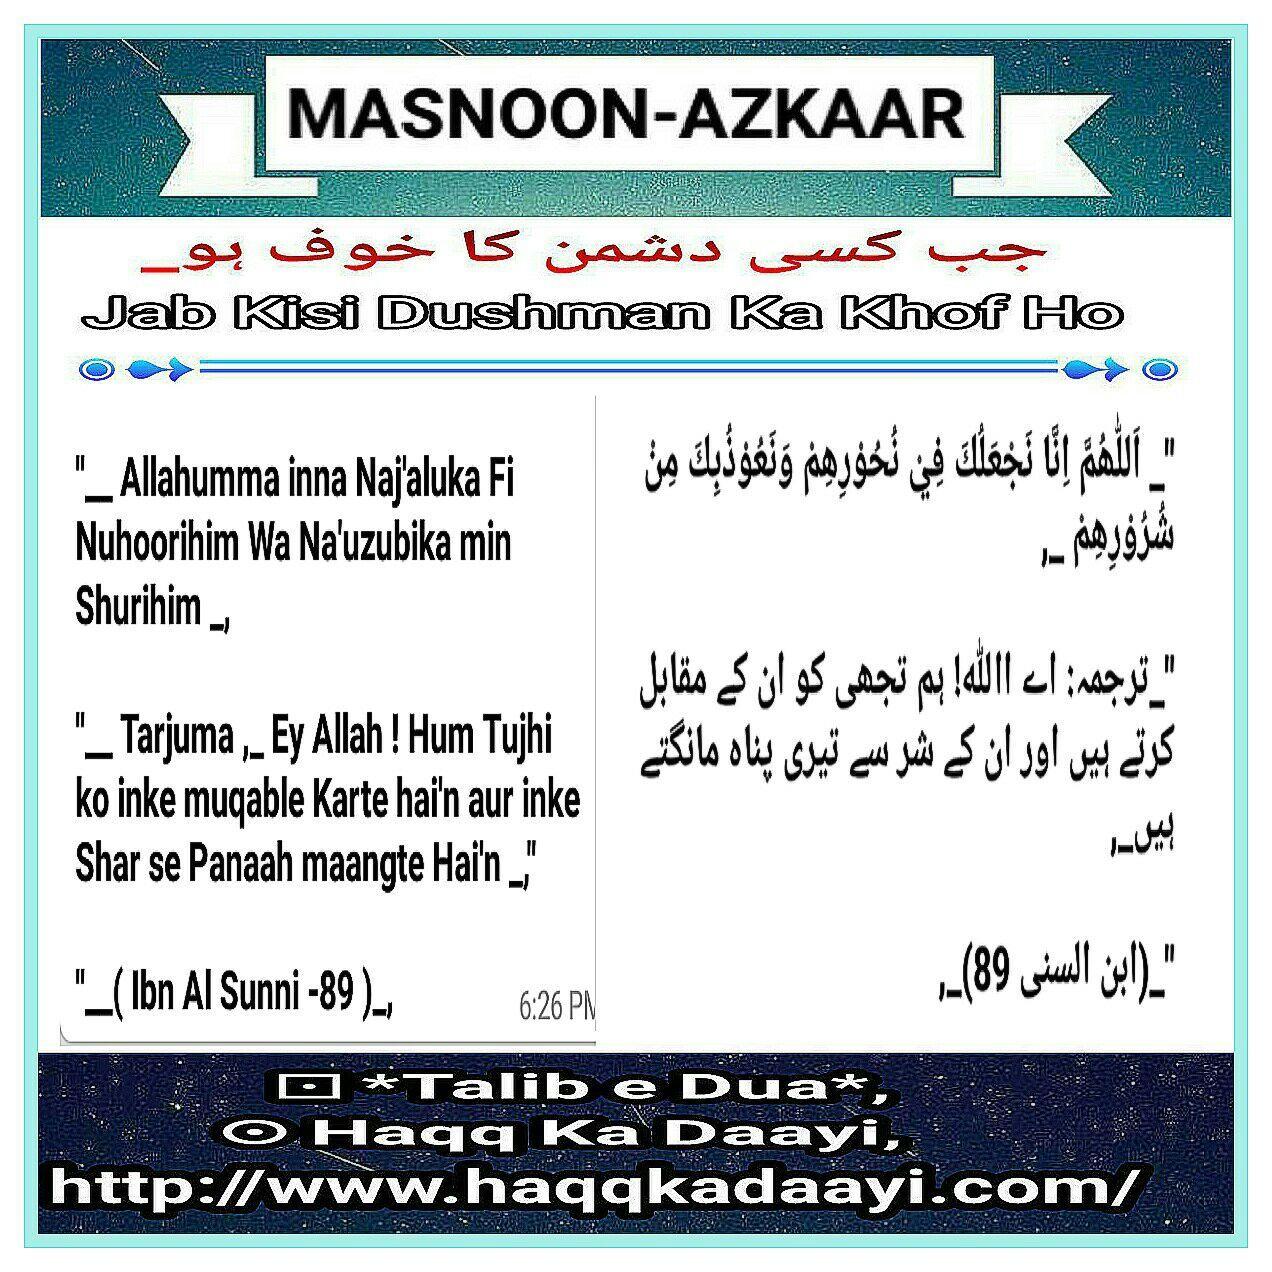 Dua Jab Kisi Dushman Ka Khof Ho Islamic Messages Hadith Quotes Hadith Sharif